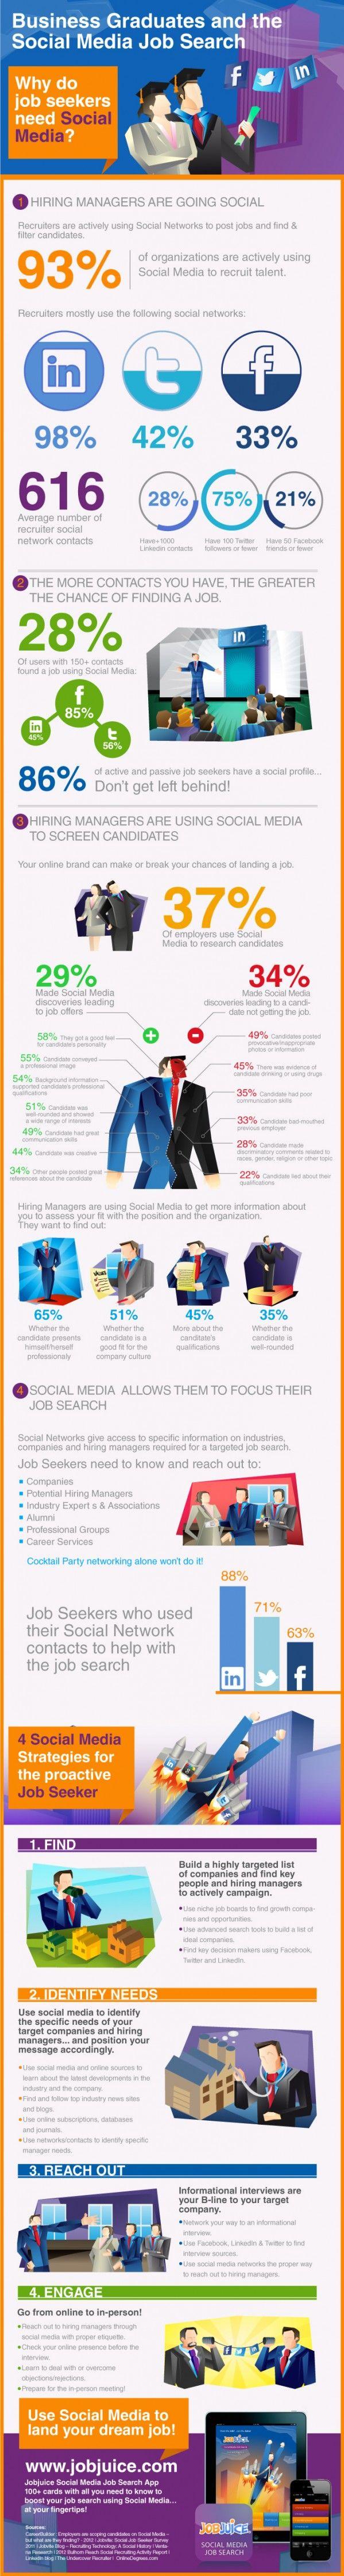 Social Media Strategies for Proactive Job Seekers